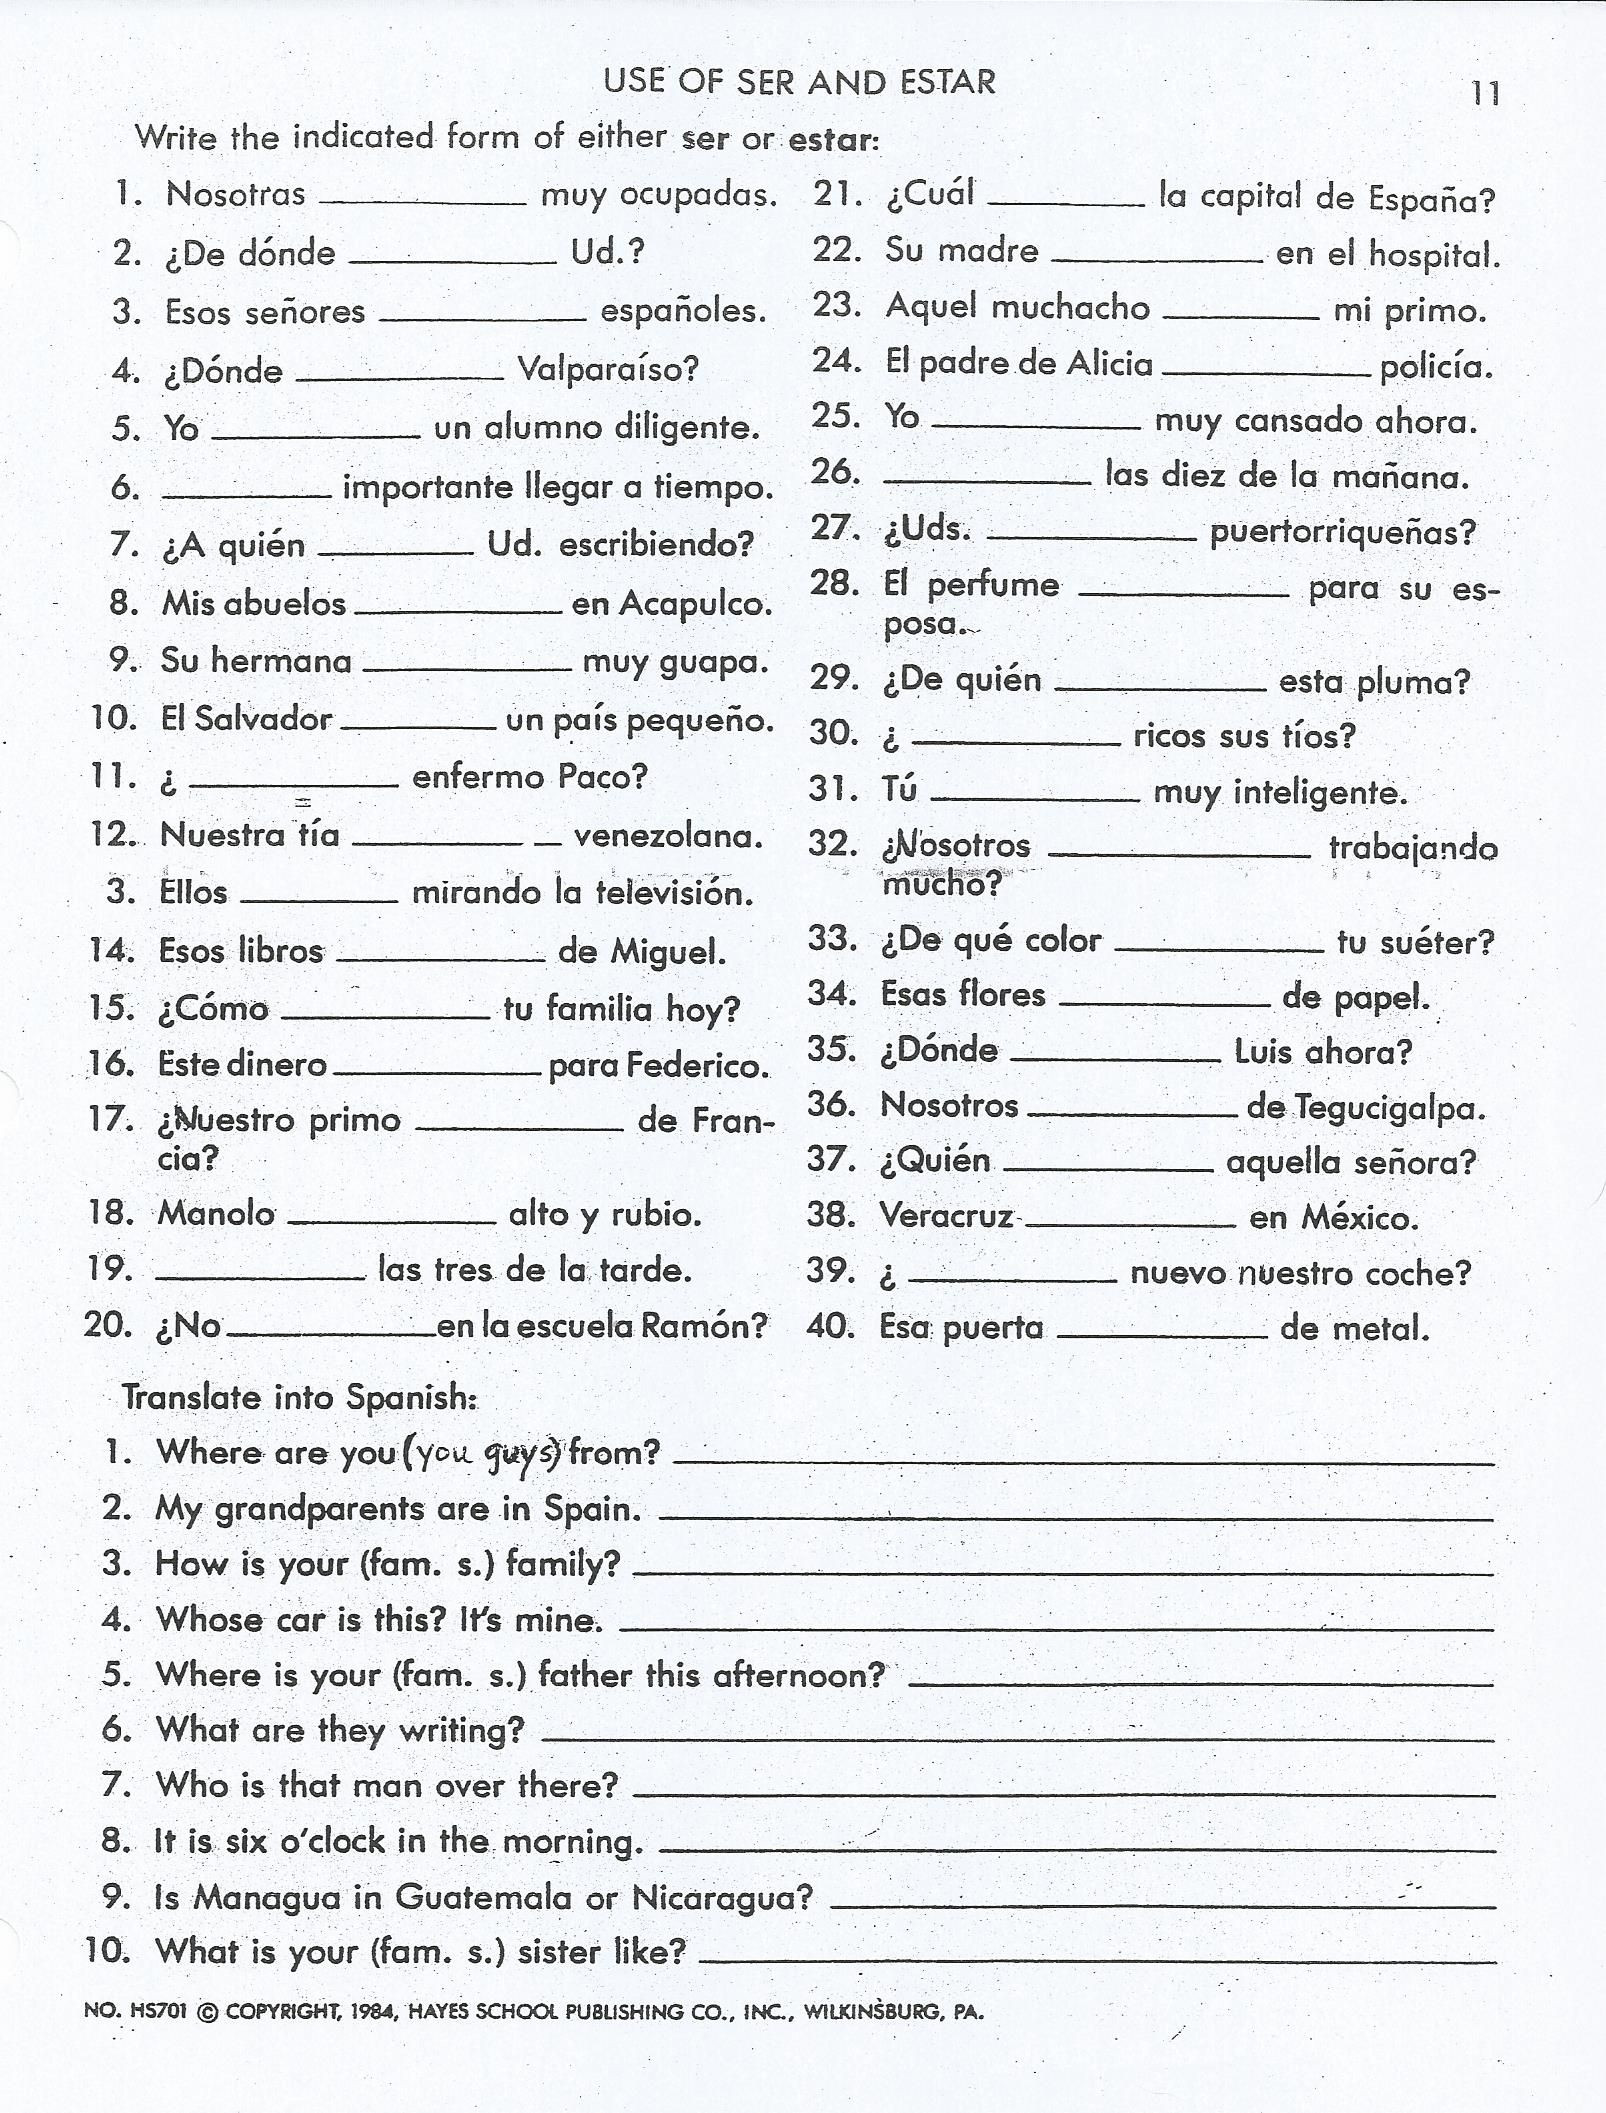 Ser Estar Worksheet Answers Ser Vs Estar Activities Worksheet Google Search